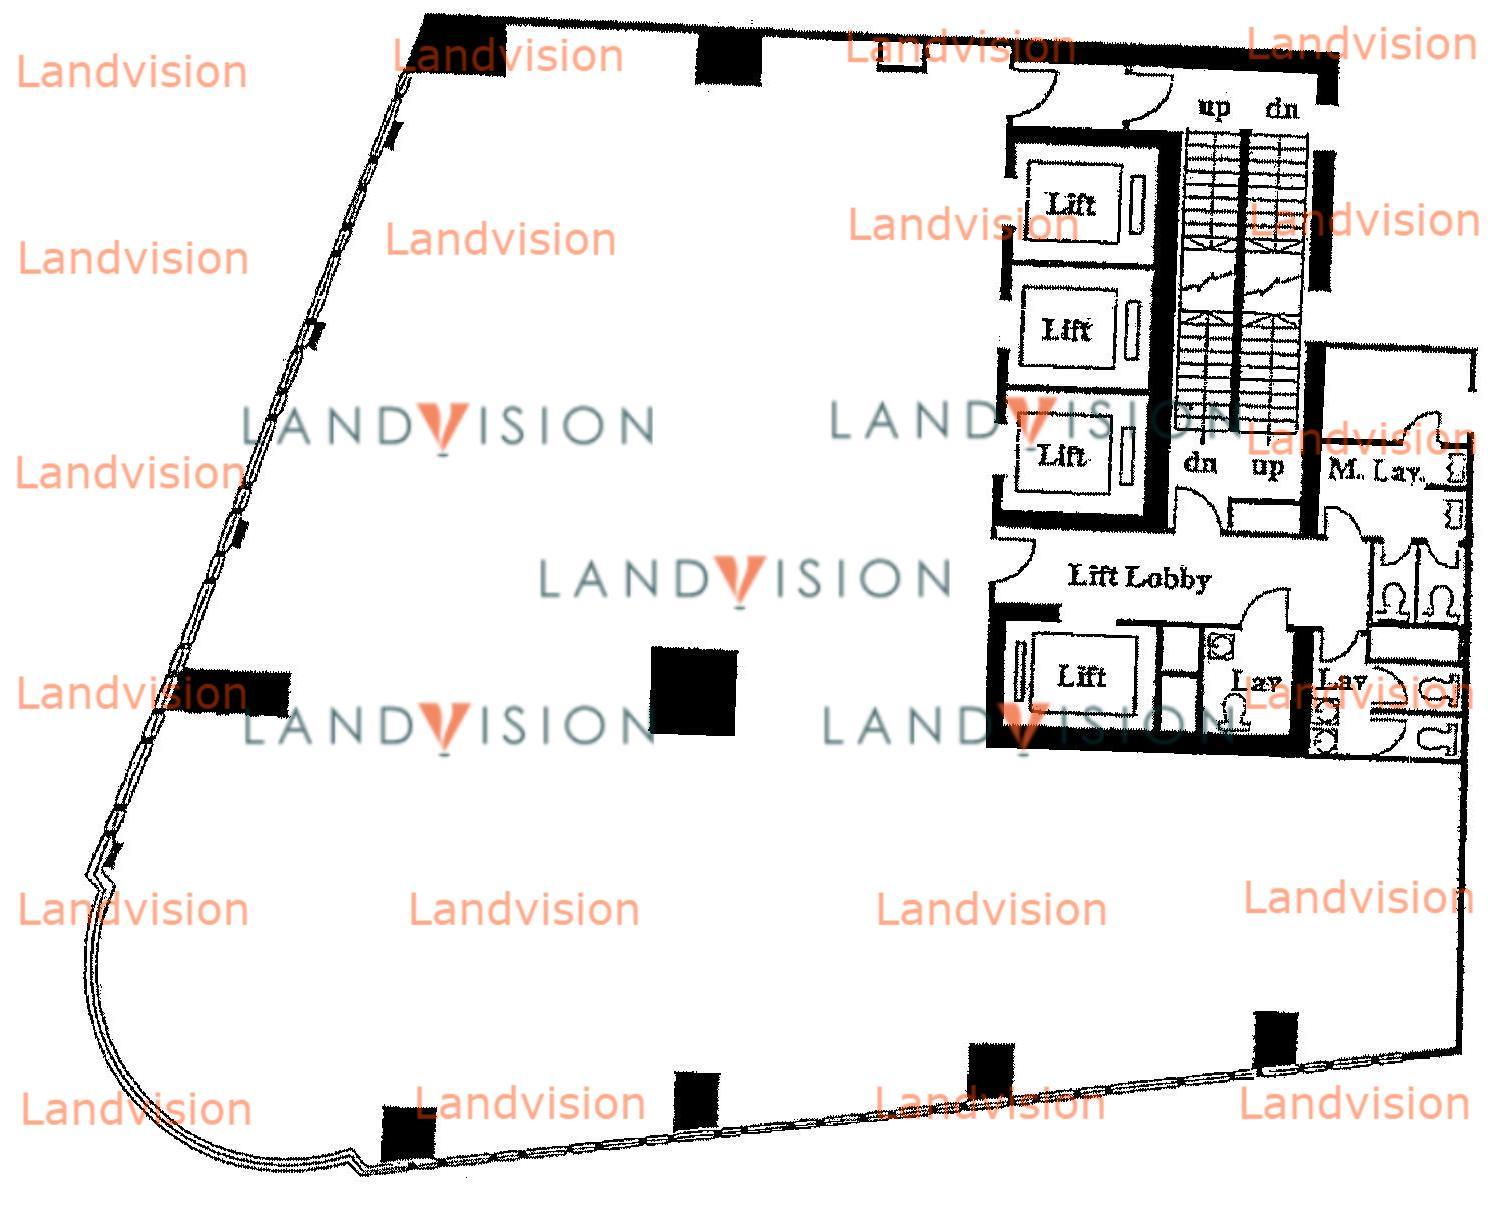 https://www.landvision.com.hk/wp-content/uploads/website/resize/floorplans/000730.JPG